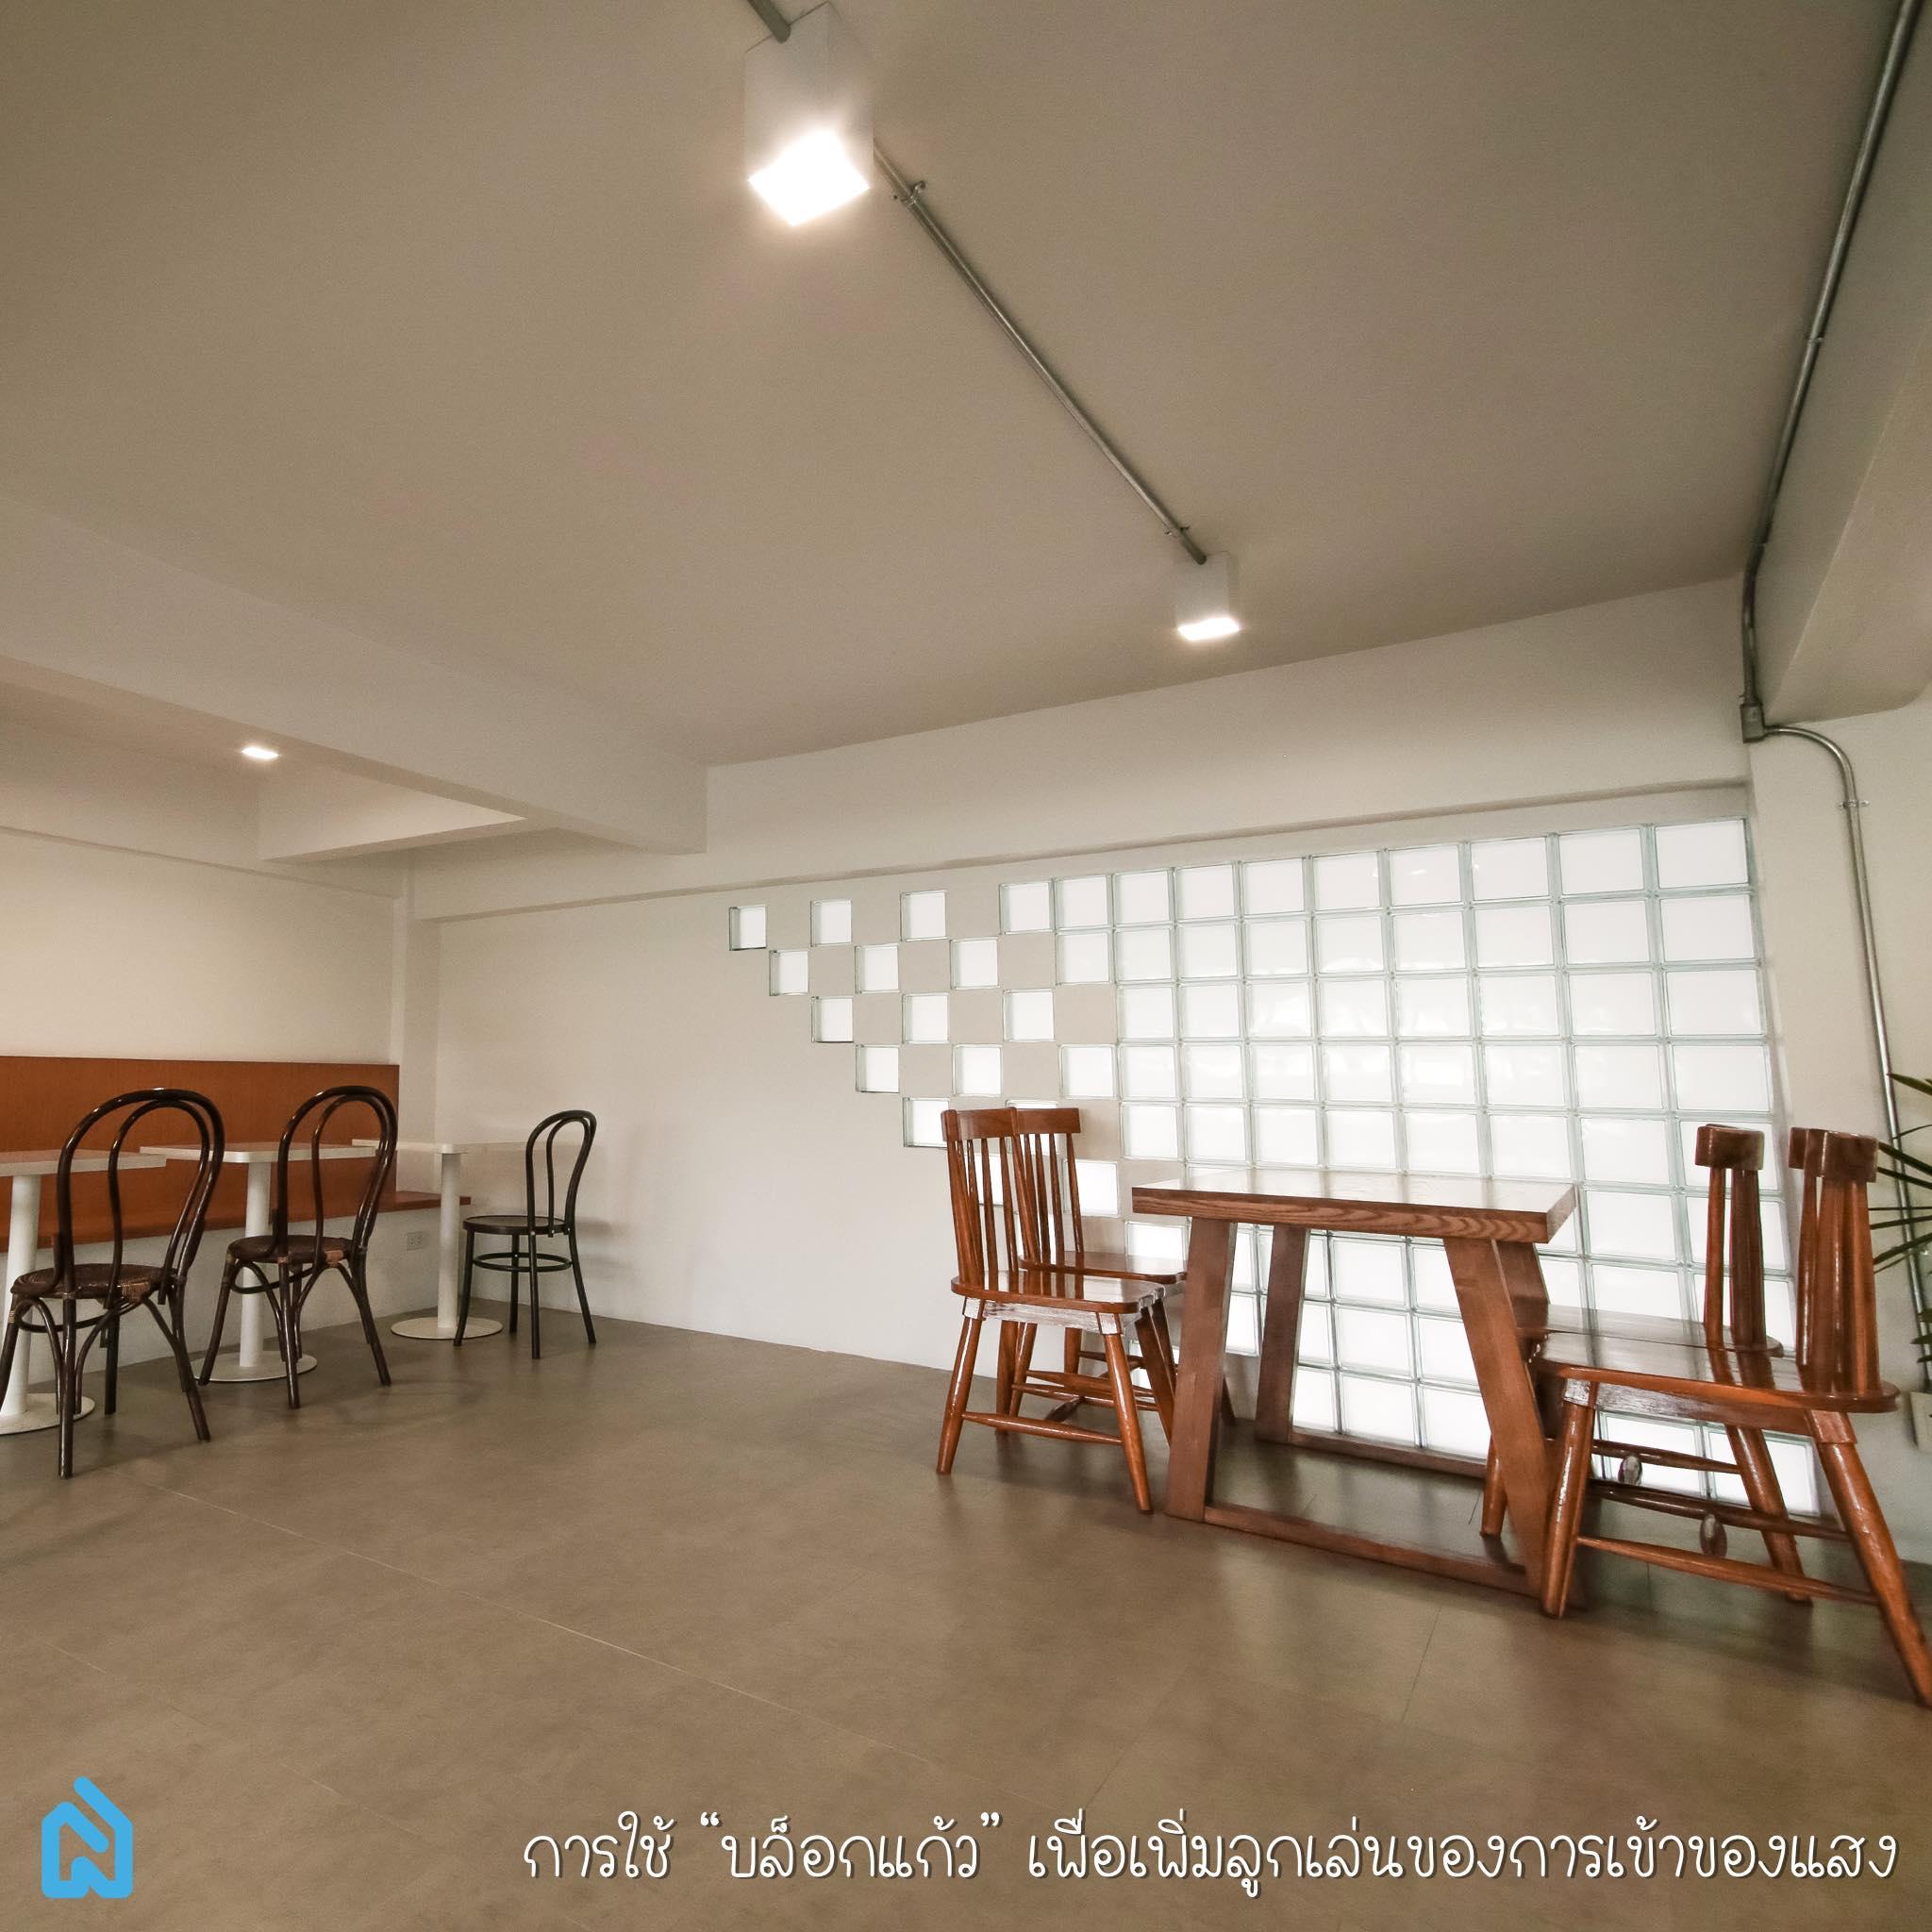 All In White cafe renovate ขอนแก่น